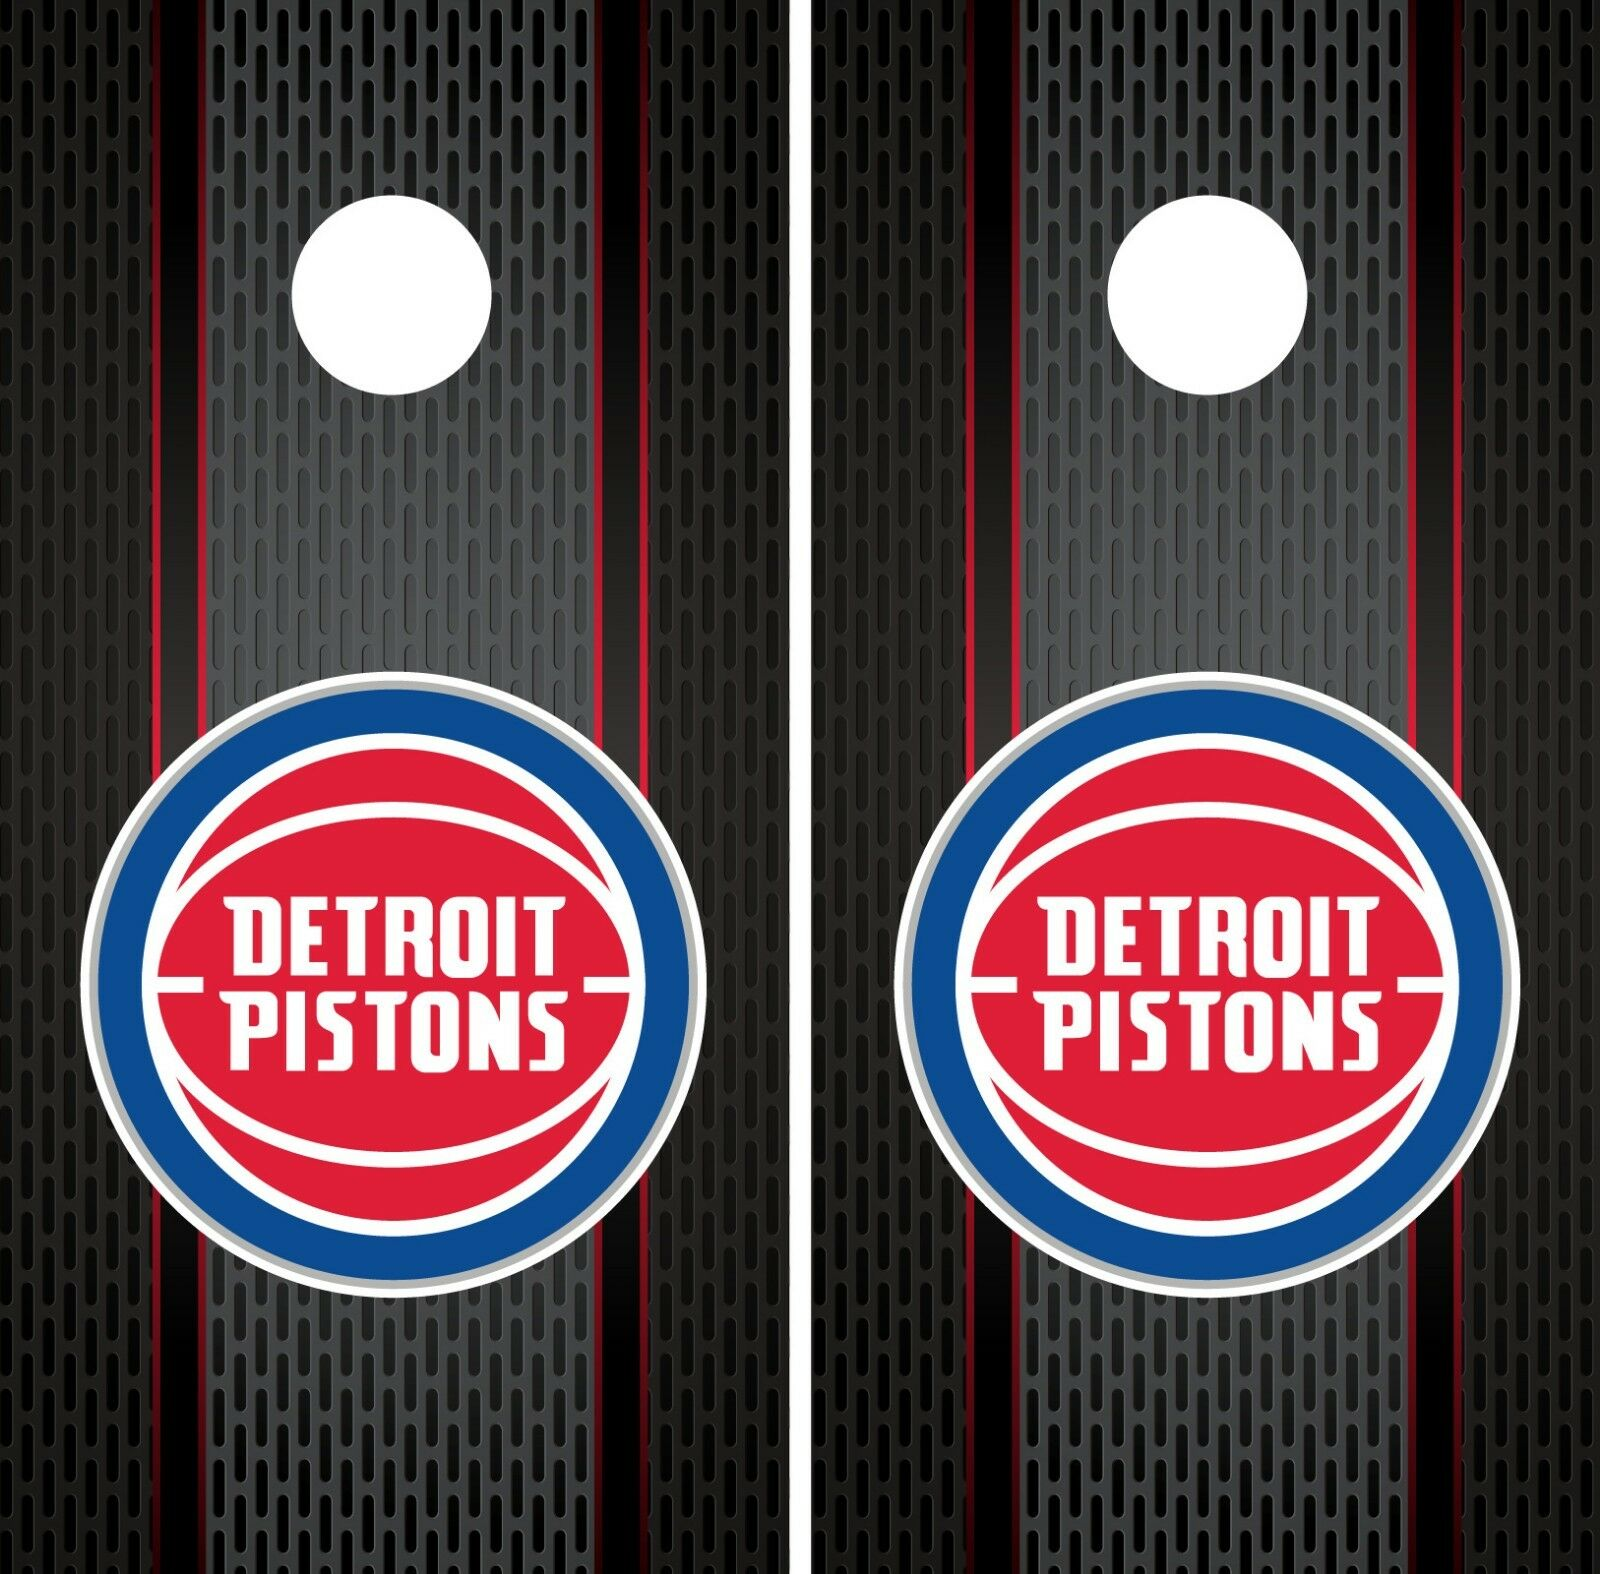 Detroit Pistons Cornhole Wrap NBA Game Board Skin Set Vinyl Decal Art CO603